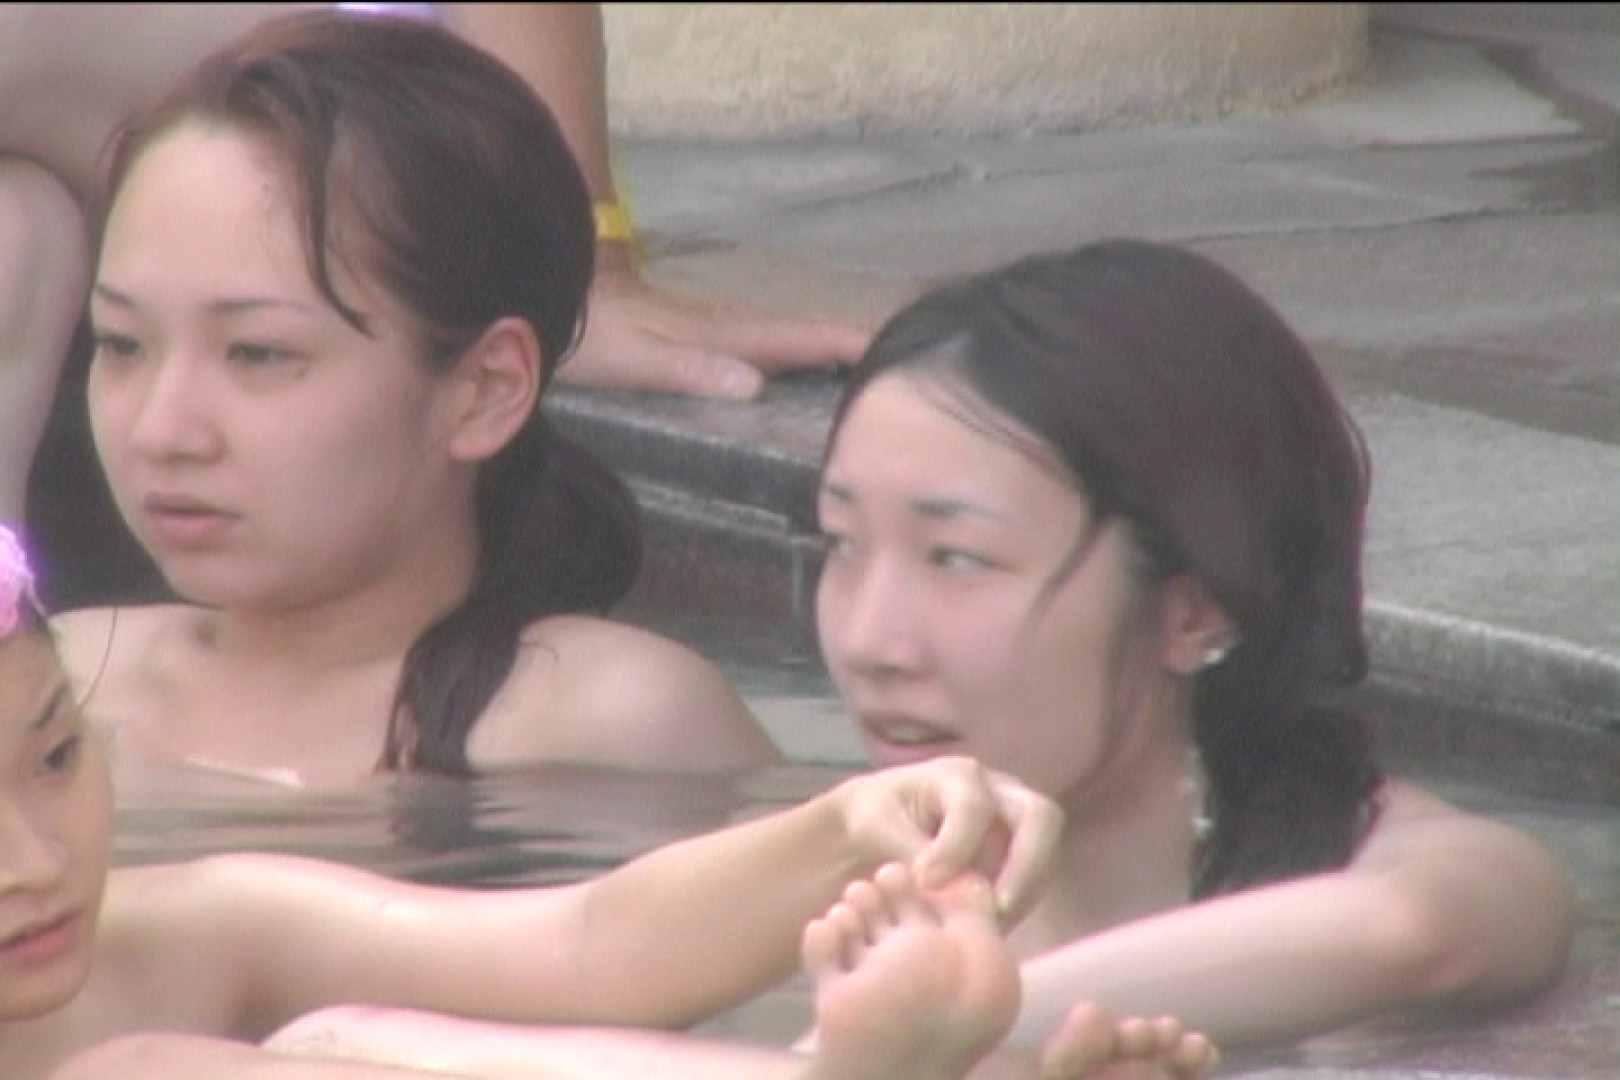 Aquaな露天風呂Vol.536 盗撮 オマンコ無修正動画無料 94連発 44